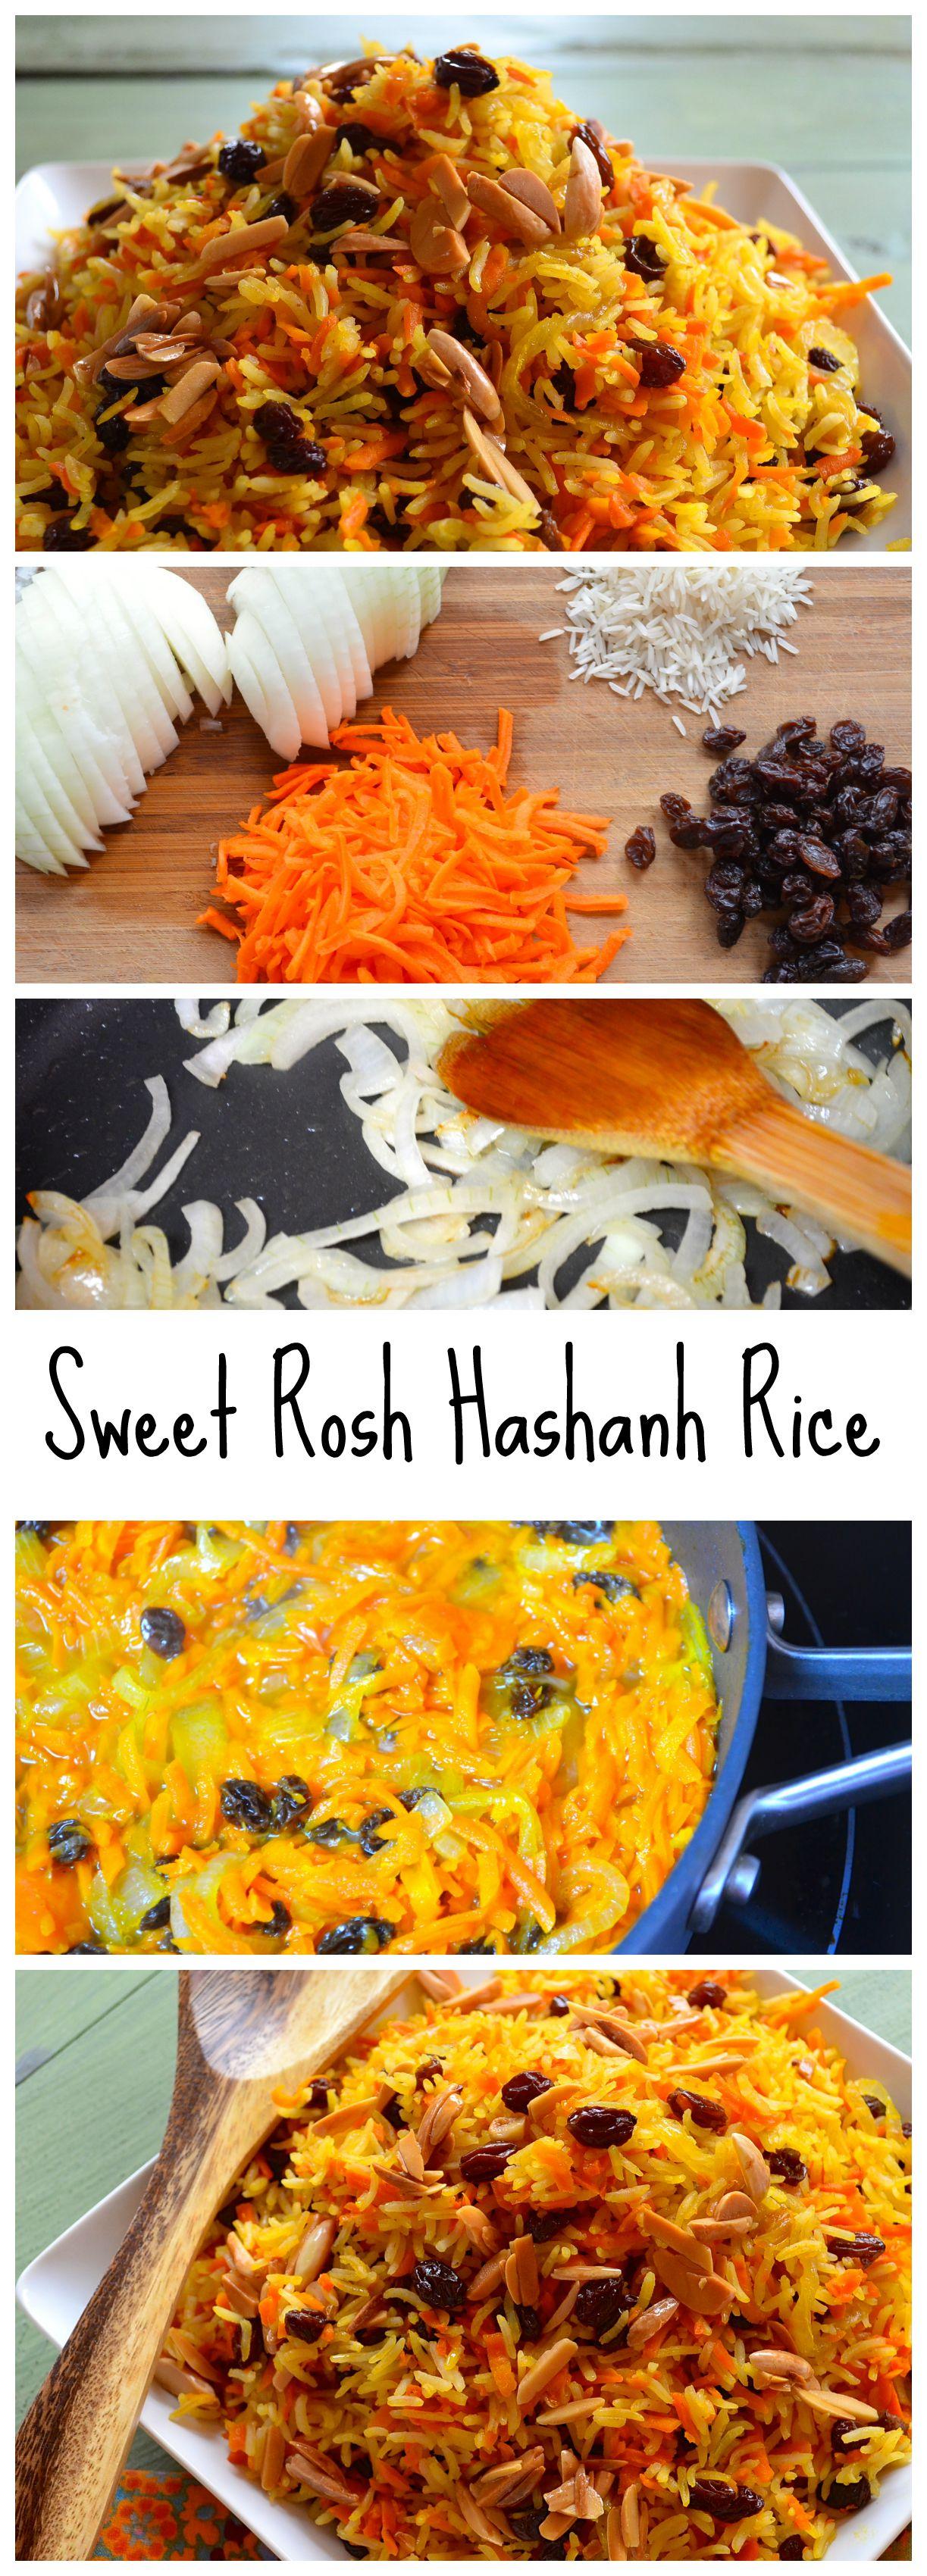 A Rosh Hashana Family Favorite: Sweet Basmati Rice with Carrots & Raisins